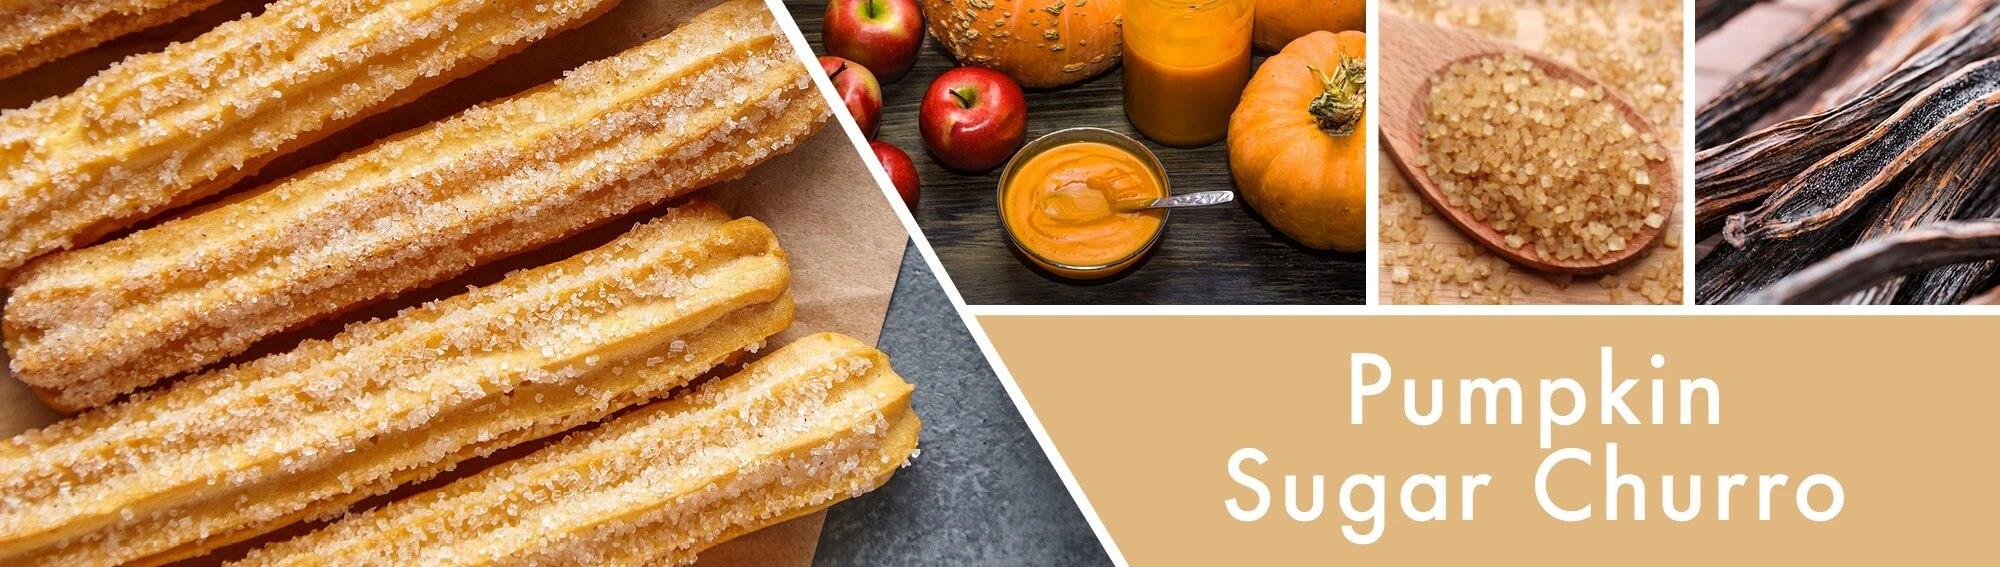 Pumpkin-Sugar-Churro-Banner